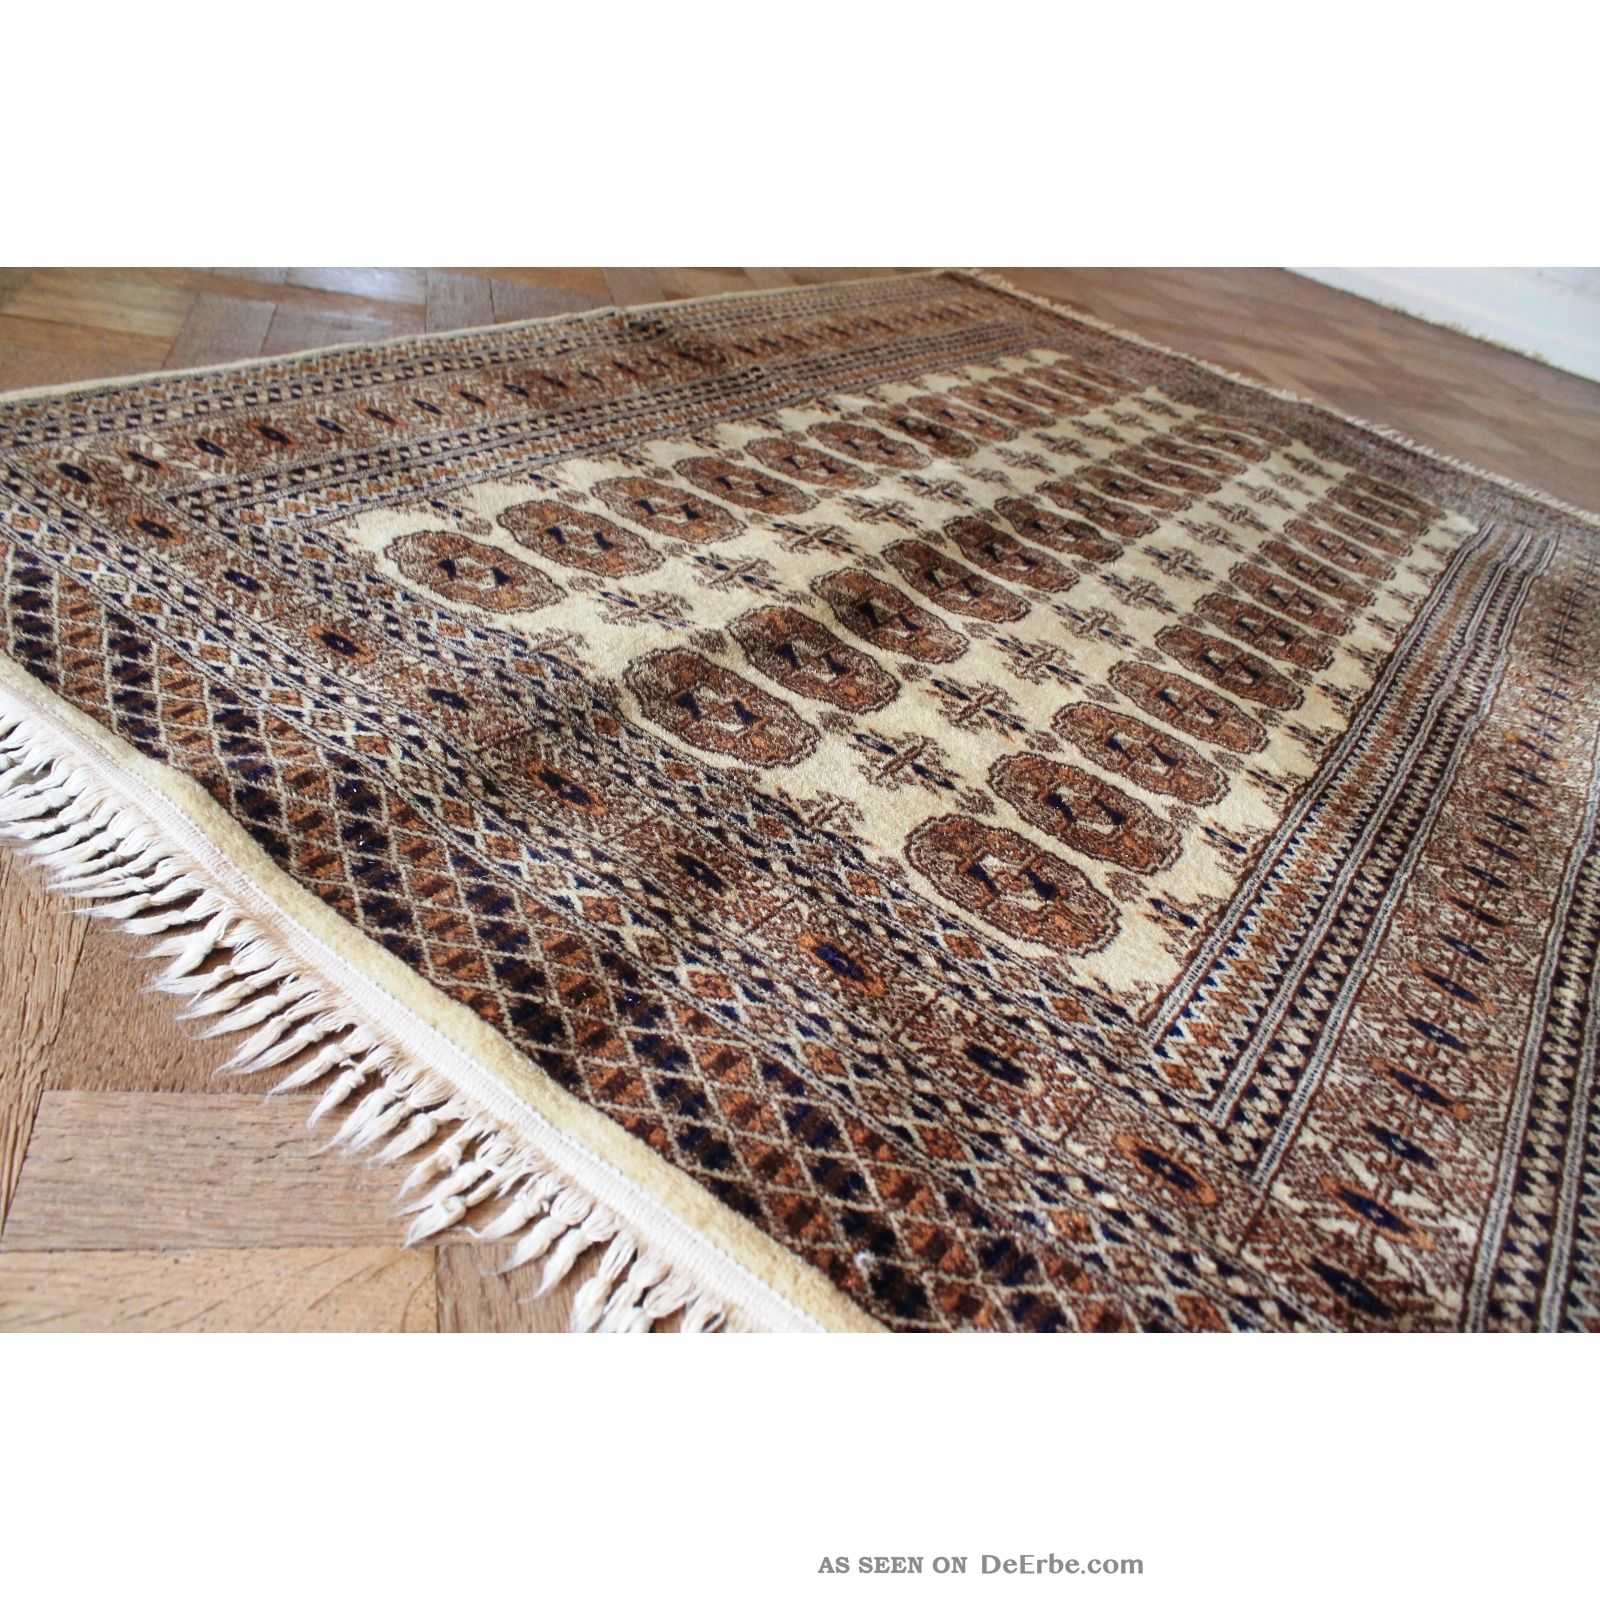 alter gewebter orient teppich buchara jomut motive carpet. Black Bedroom Furniture Sets. Home Design Ideas